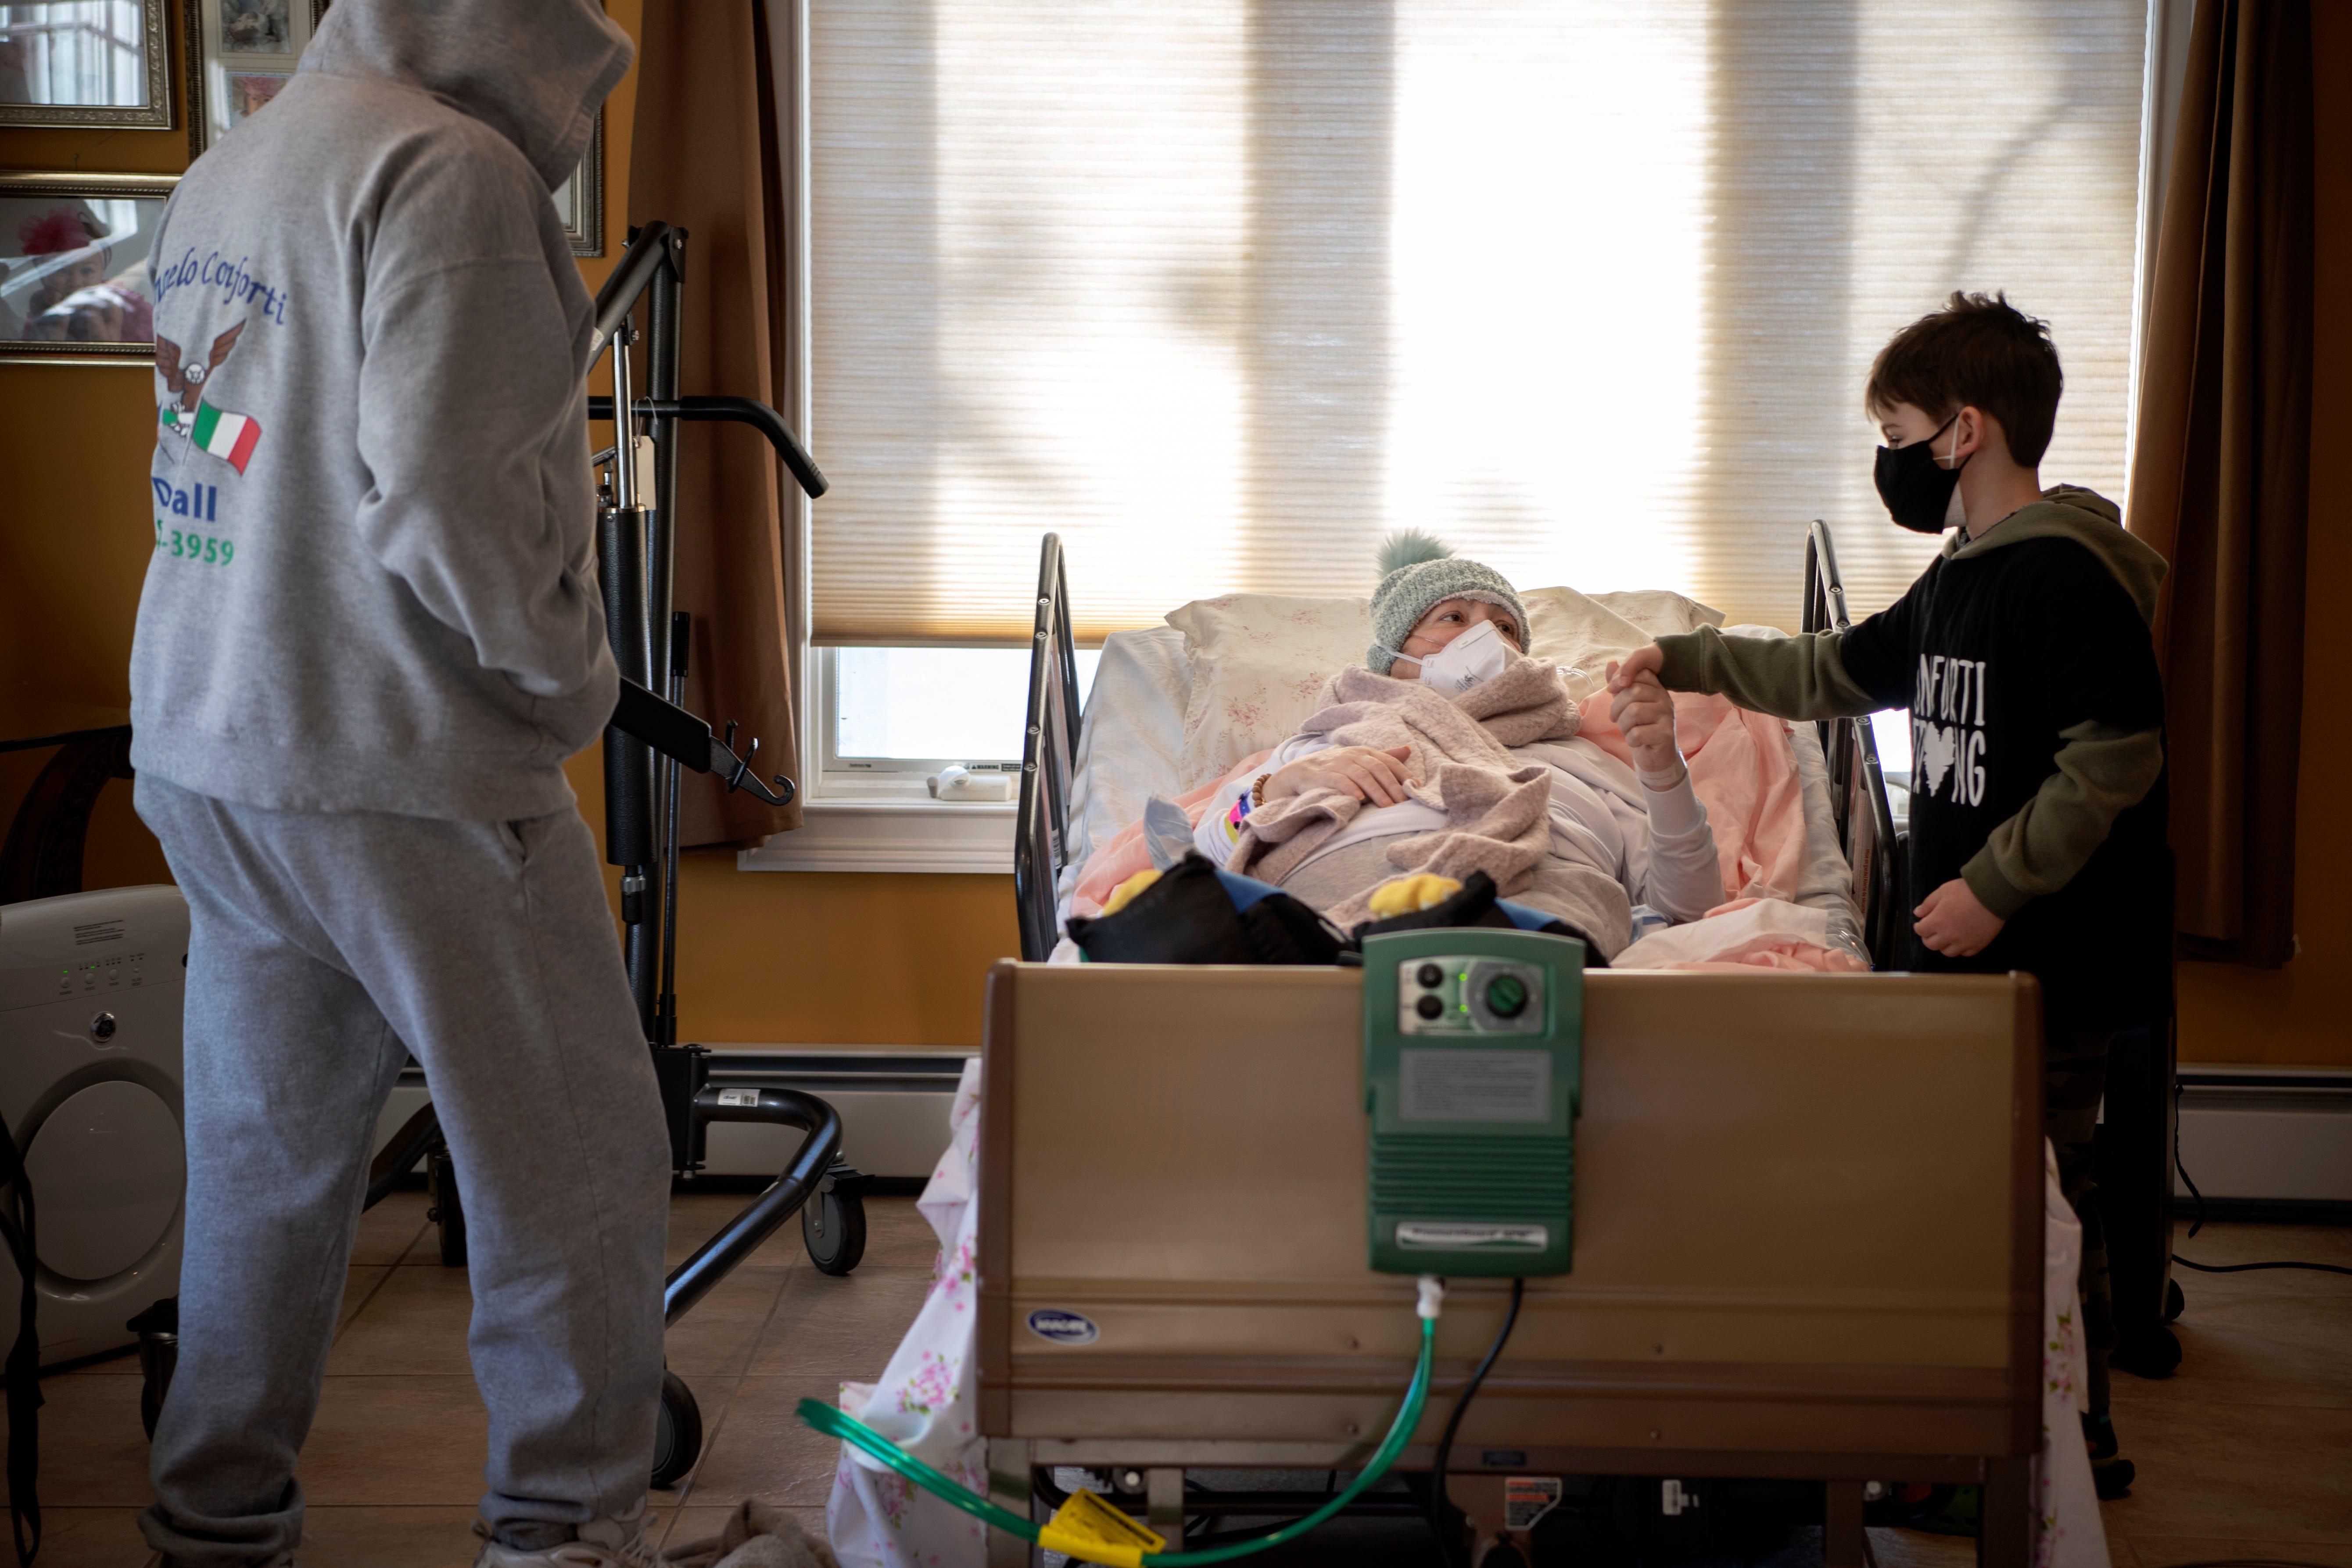 Medical Center fogyás a LOSINOOSTROVSKY